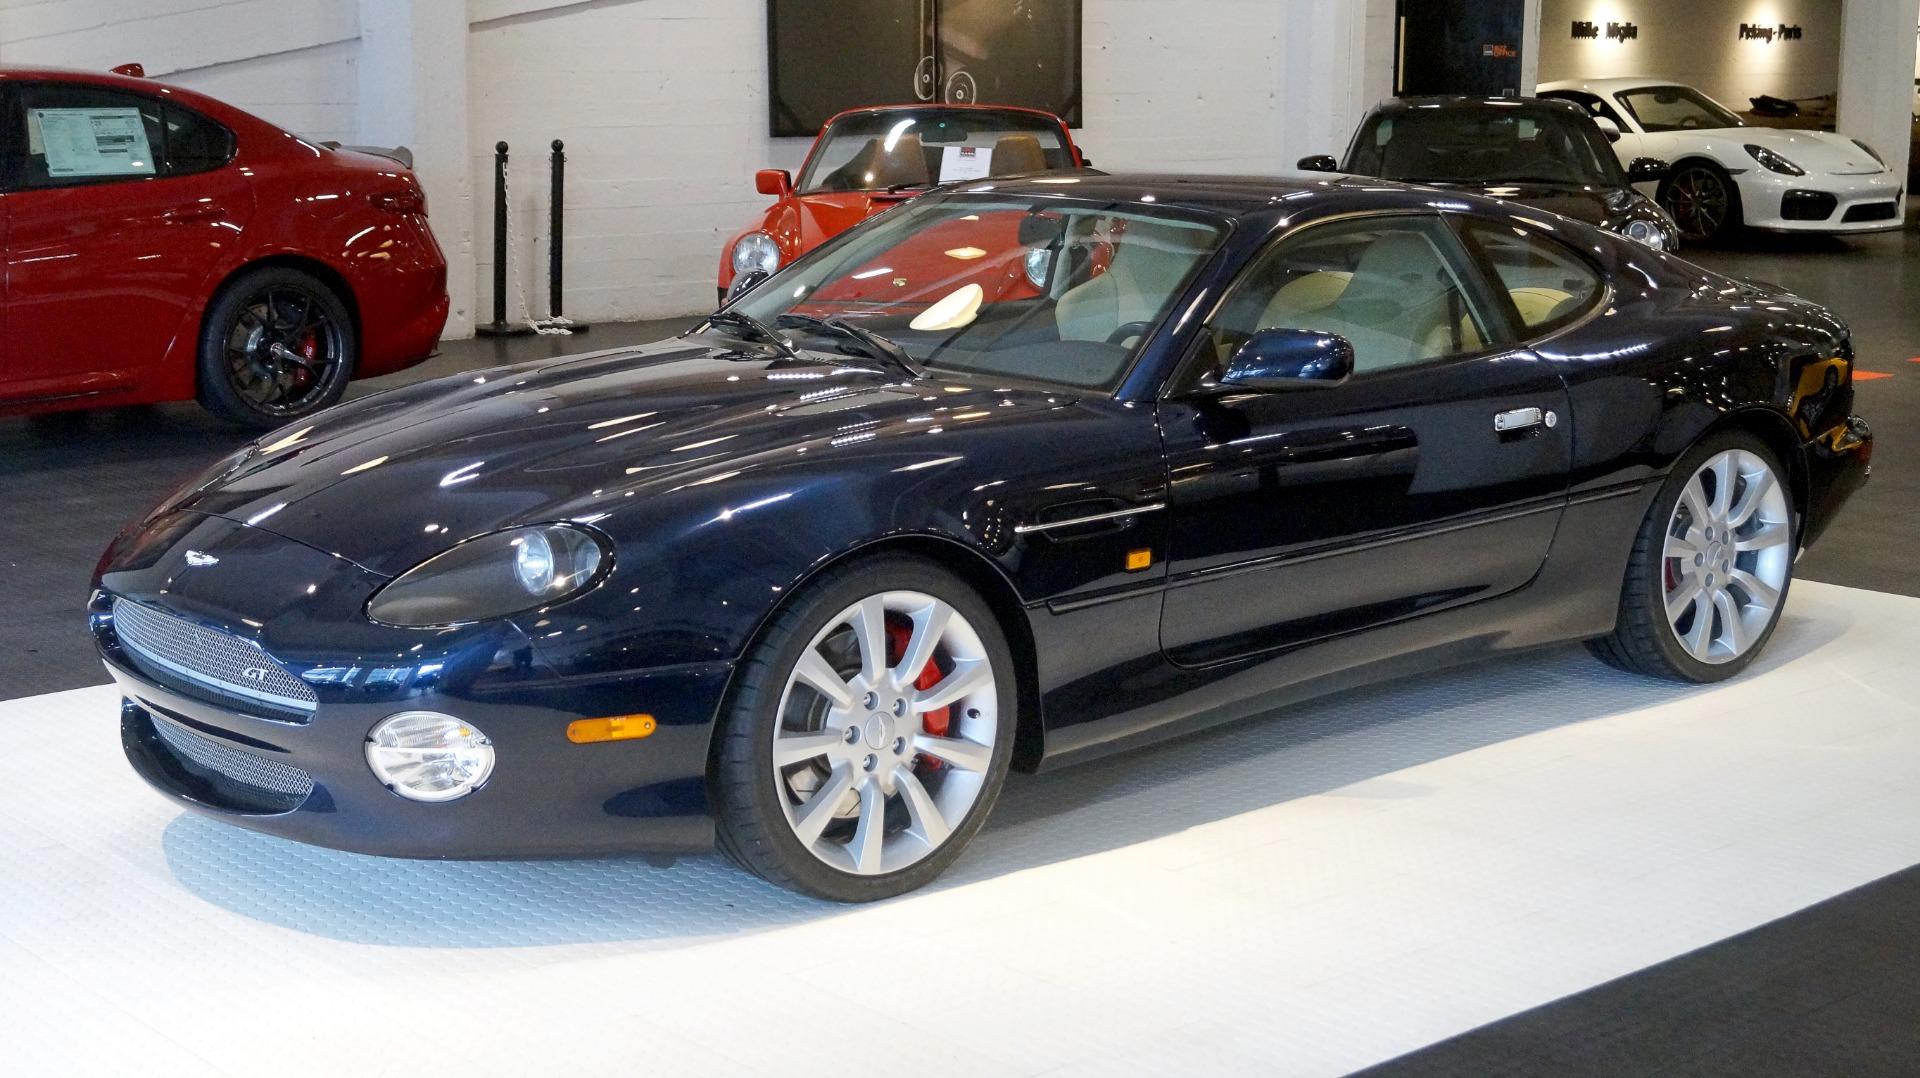 Used 2003 Aston Martin Db7 Gt For Sale 78 700 Cars Dawydiak Stock 171212c